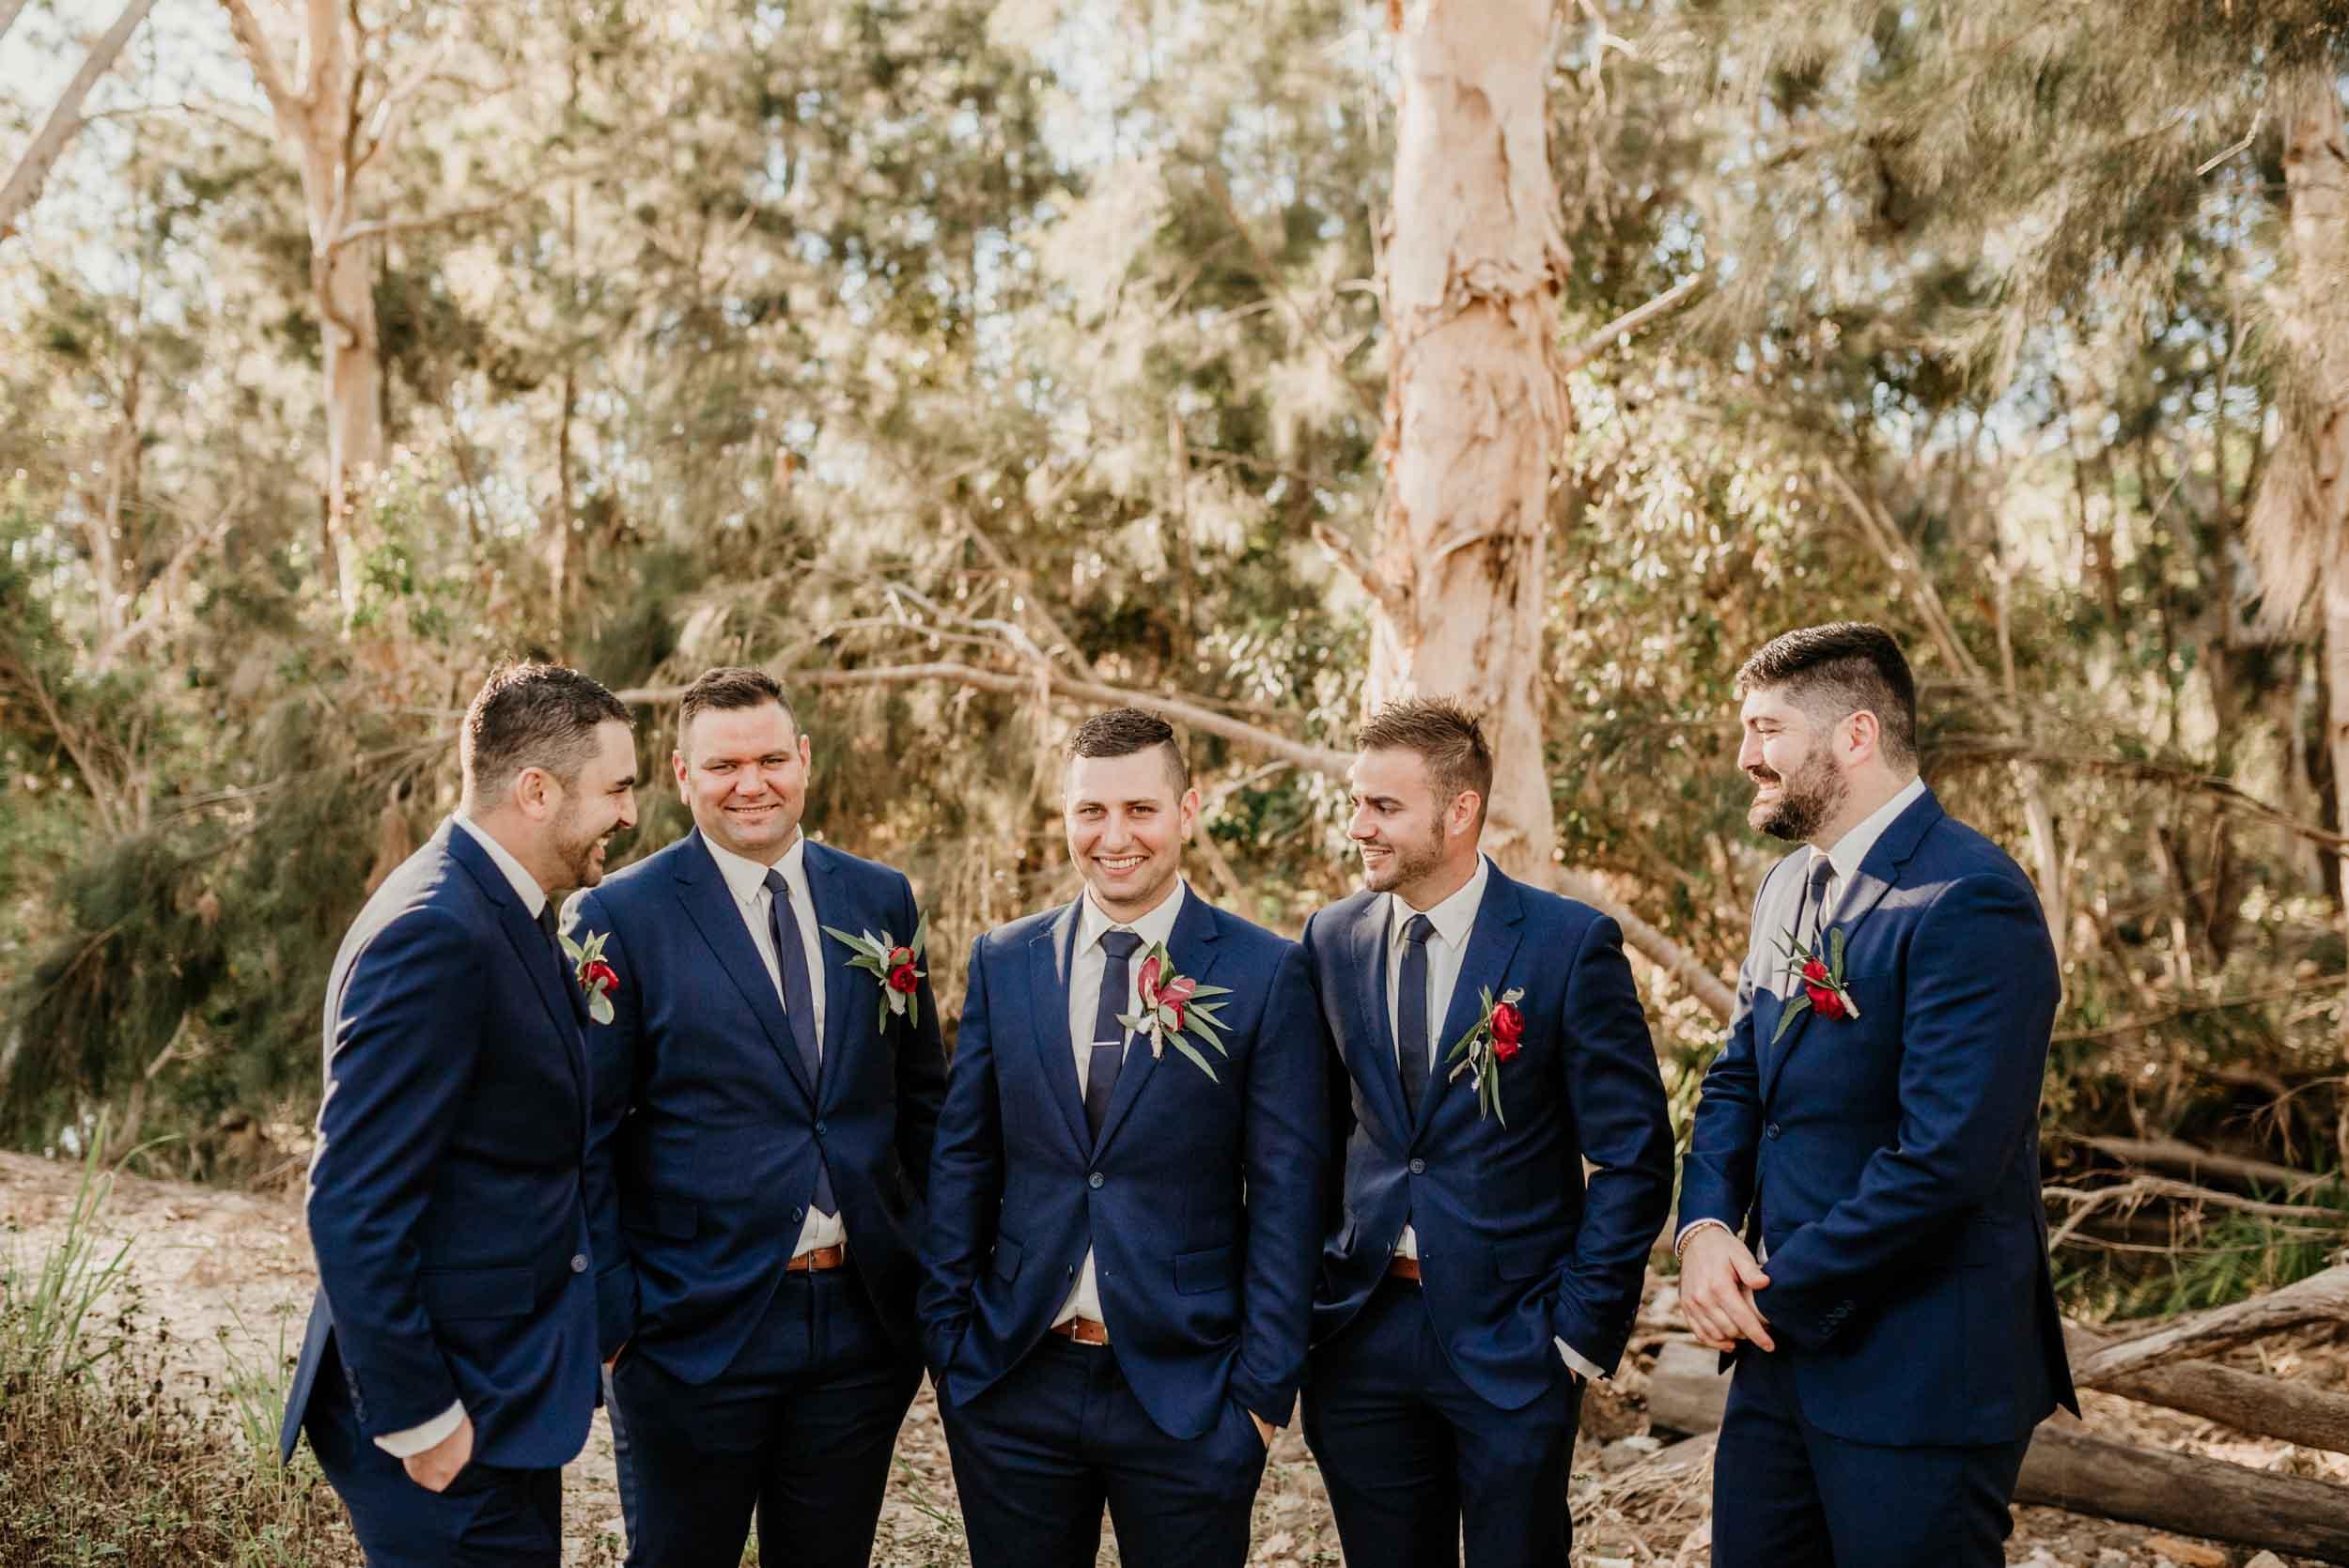 The Raw Photographer - Cairns Wedding Photographer - Atherton Tablelands - Mareeba farm Wedding - Irene Costa's Devine Bridal - Candid - Photo Package-31.jpg